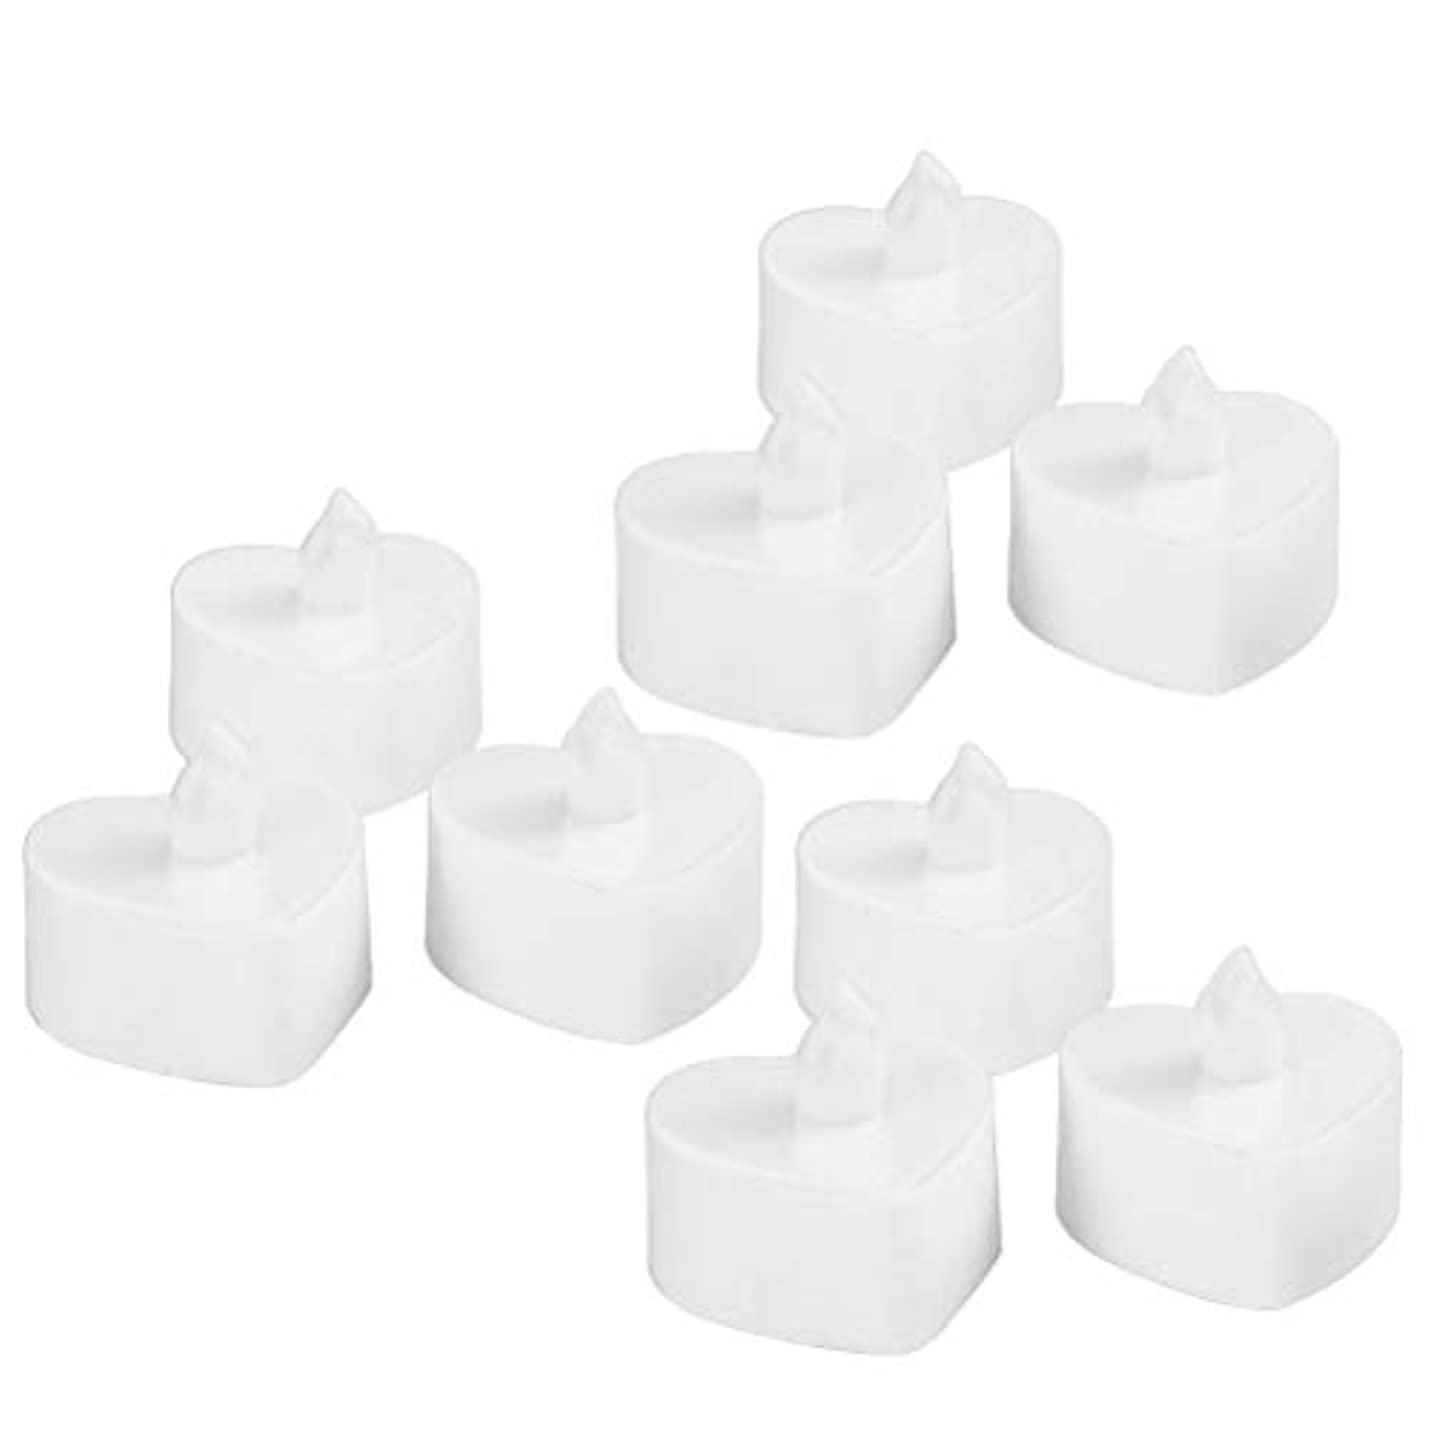 BESTOYARD 10個無炎キャンドルバッテリーは、キャンドルの結婚式のパーティーフェスティバルの装飾(白いシェル黄色の光)